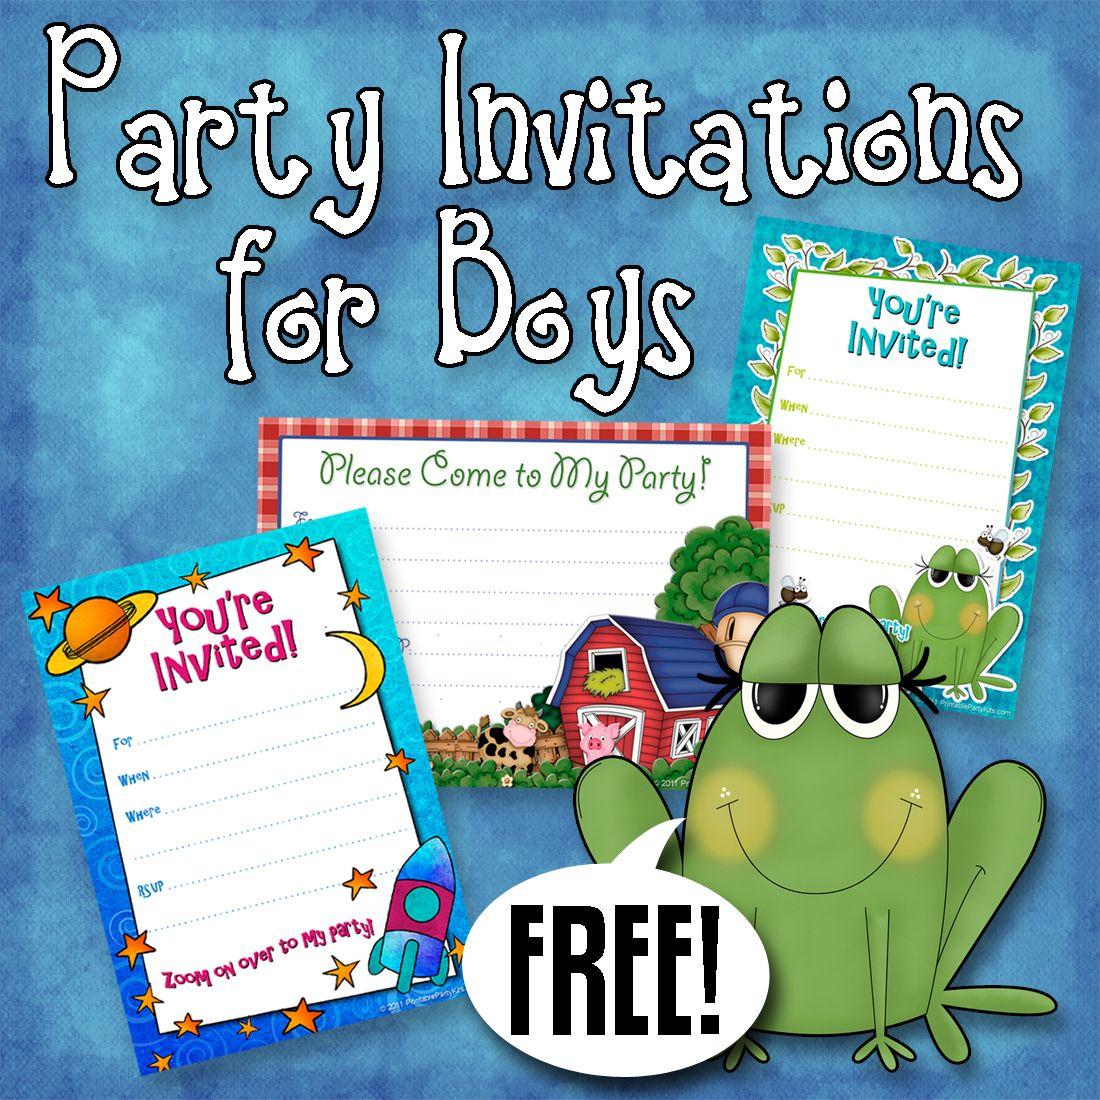 Free Printable Boys Birthday Party Invitations | Party Printables - Free Printable Toddler Birthday Invitations